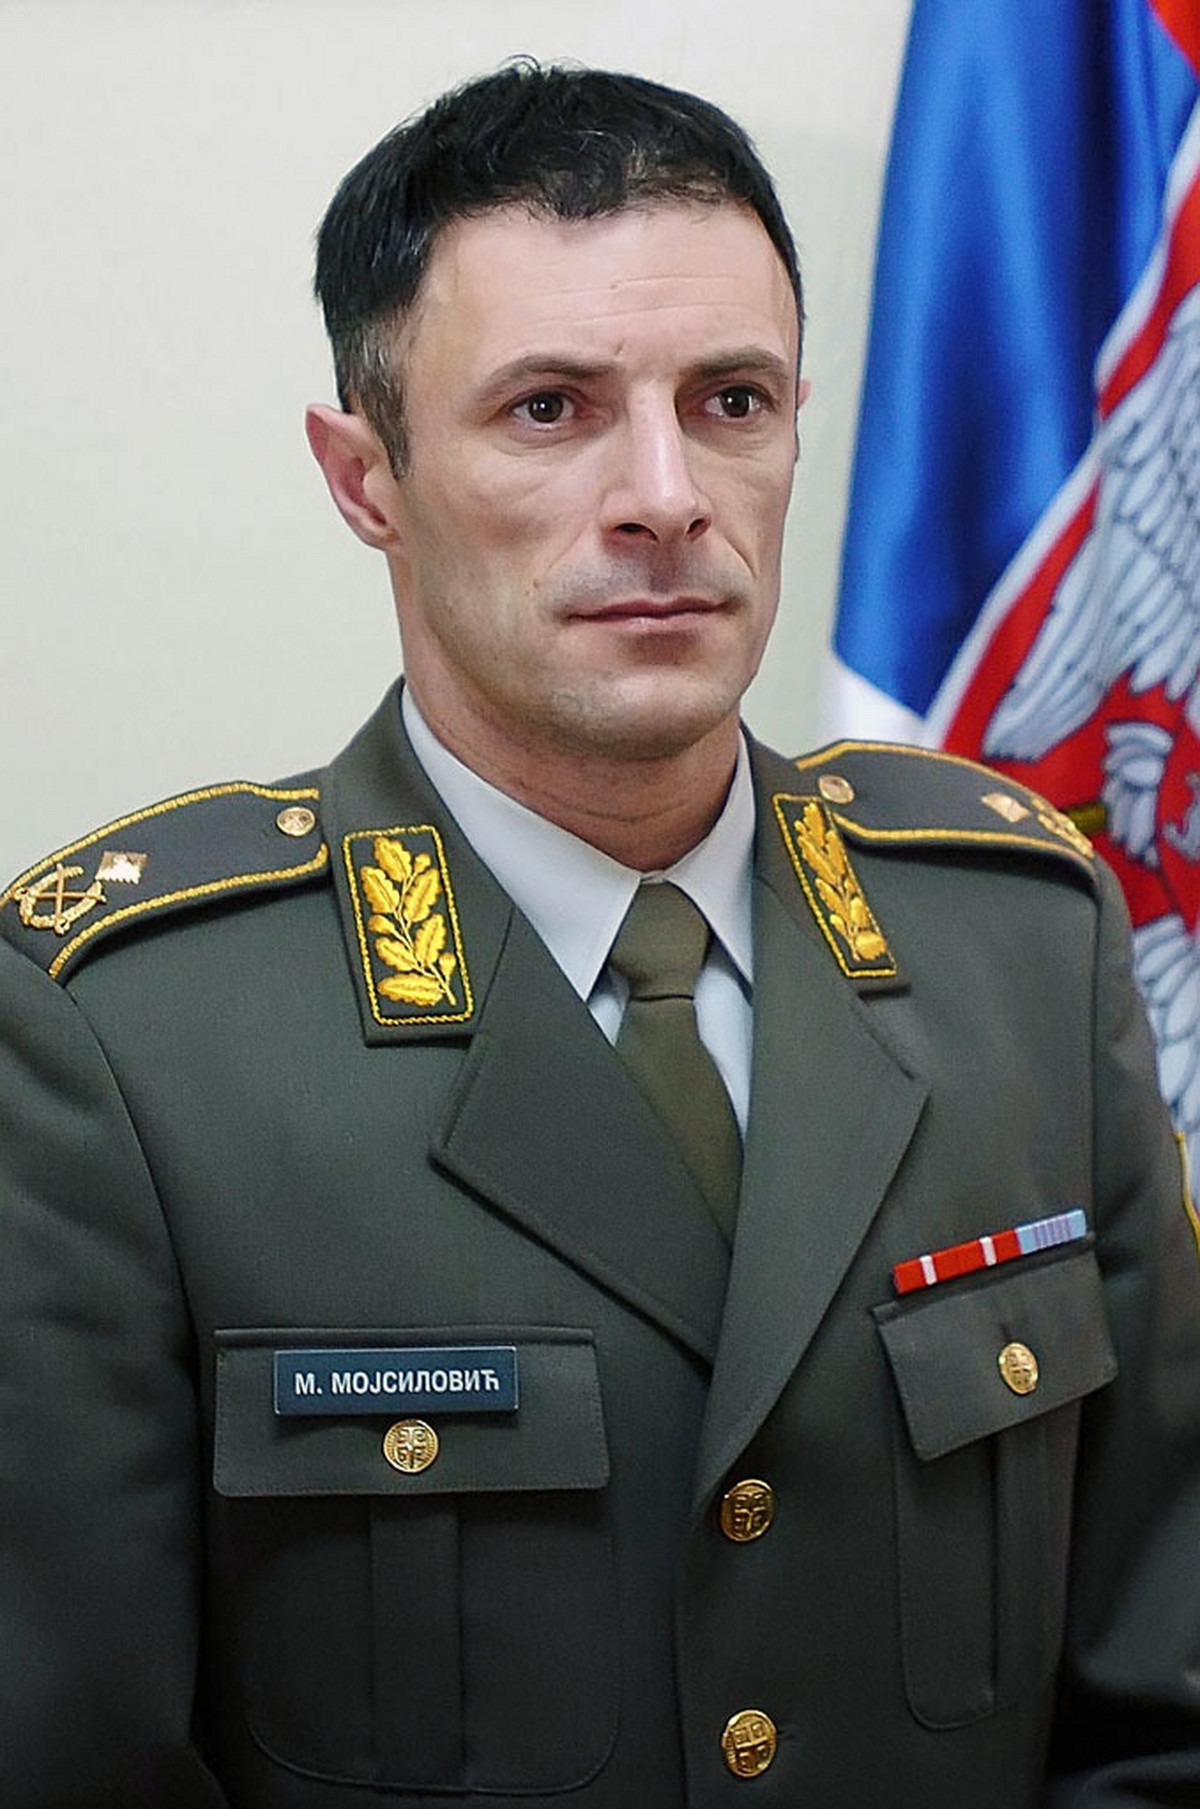 KO JE NOVI NACELNIK GENERALSTABA Milan Mojsilovic bio je vojni atase i u misiji Srbije pri NATO-u